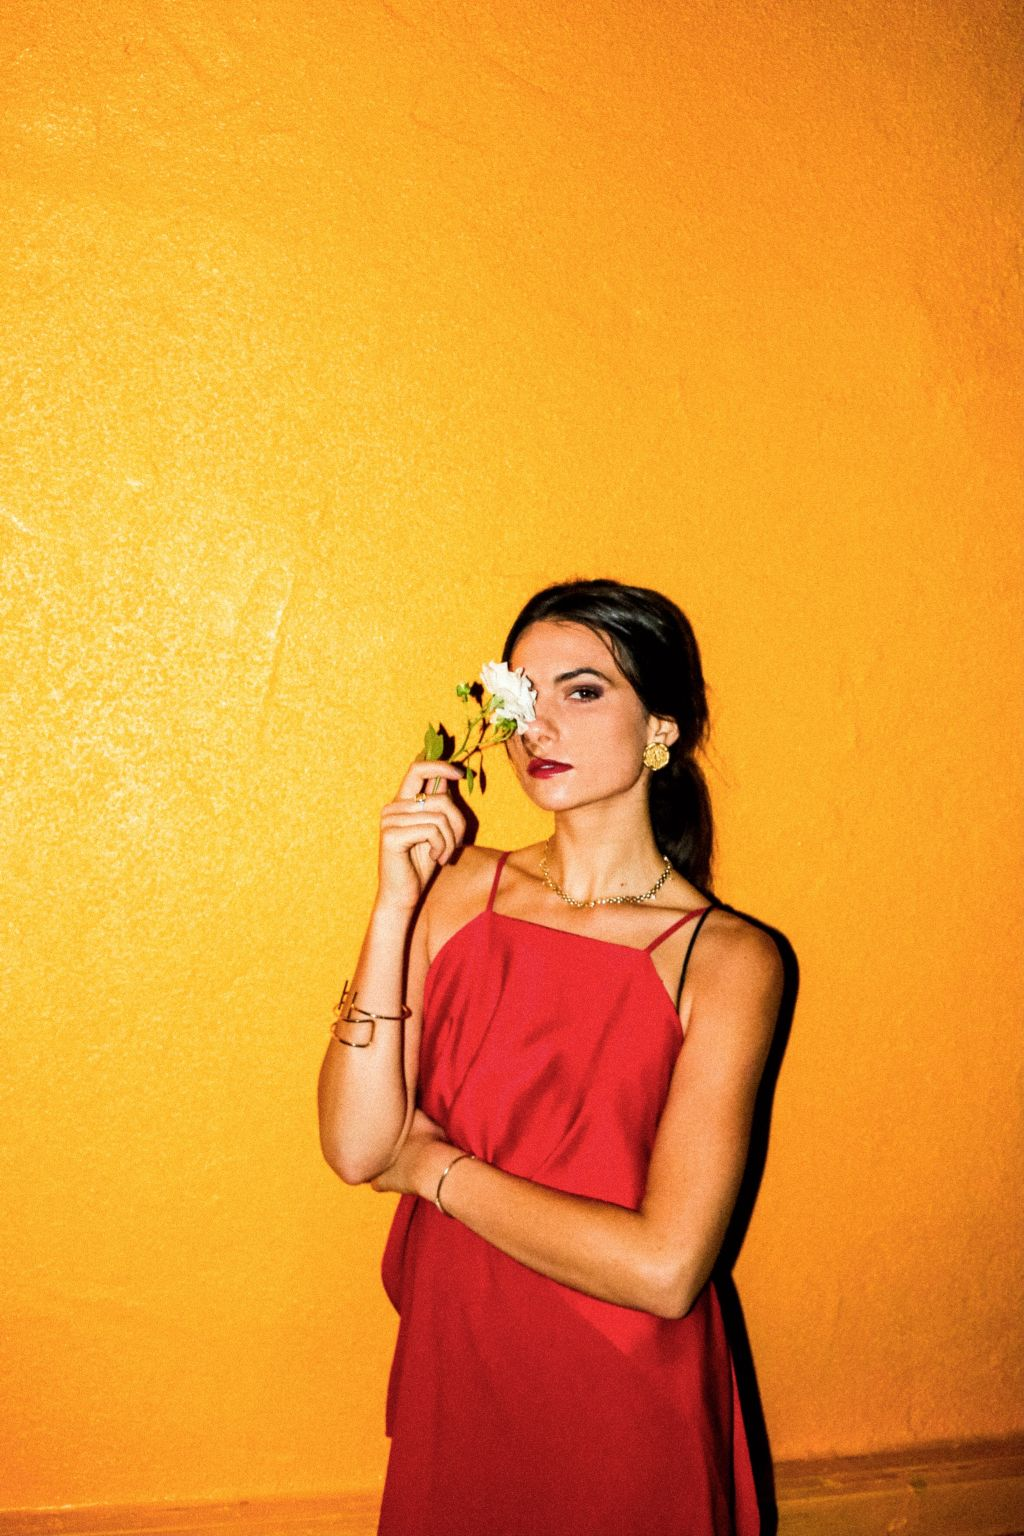 🌶🌹💃🏻     #red #fashion #fashionreadyremix #fashionstyle #fashionblog #fashionblogger #model #photography #yellow #freetoedit #remixit #people